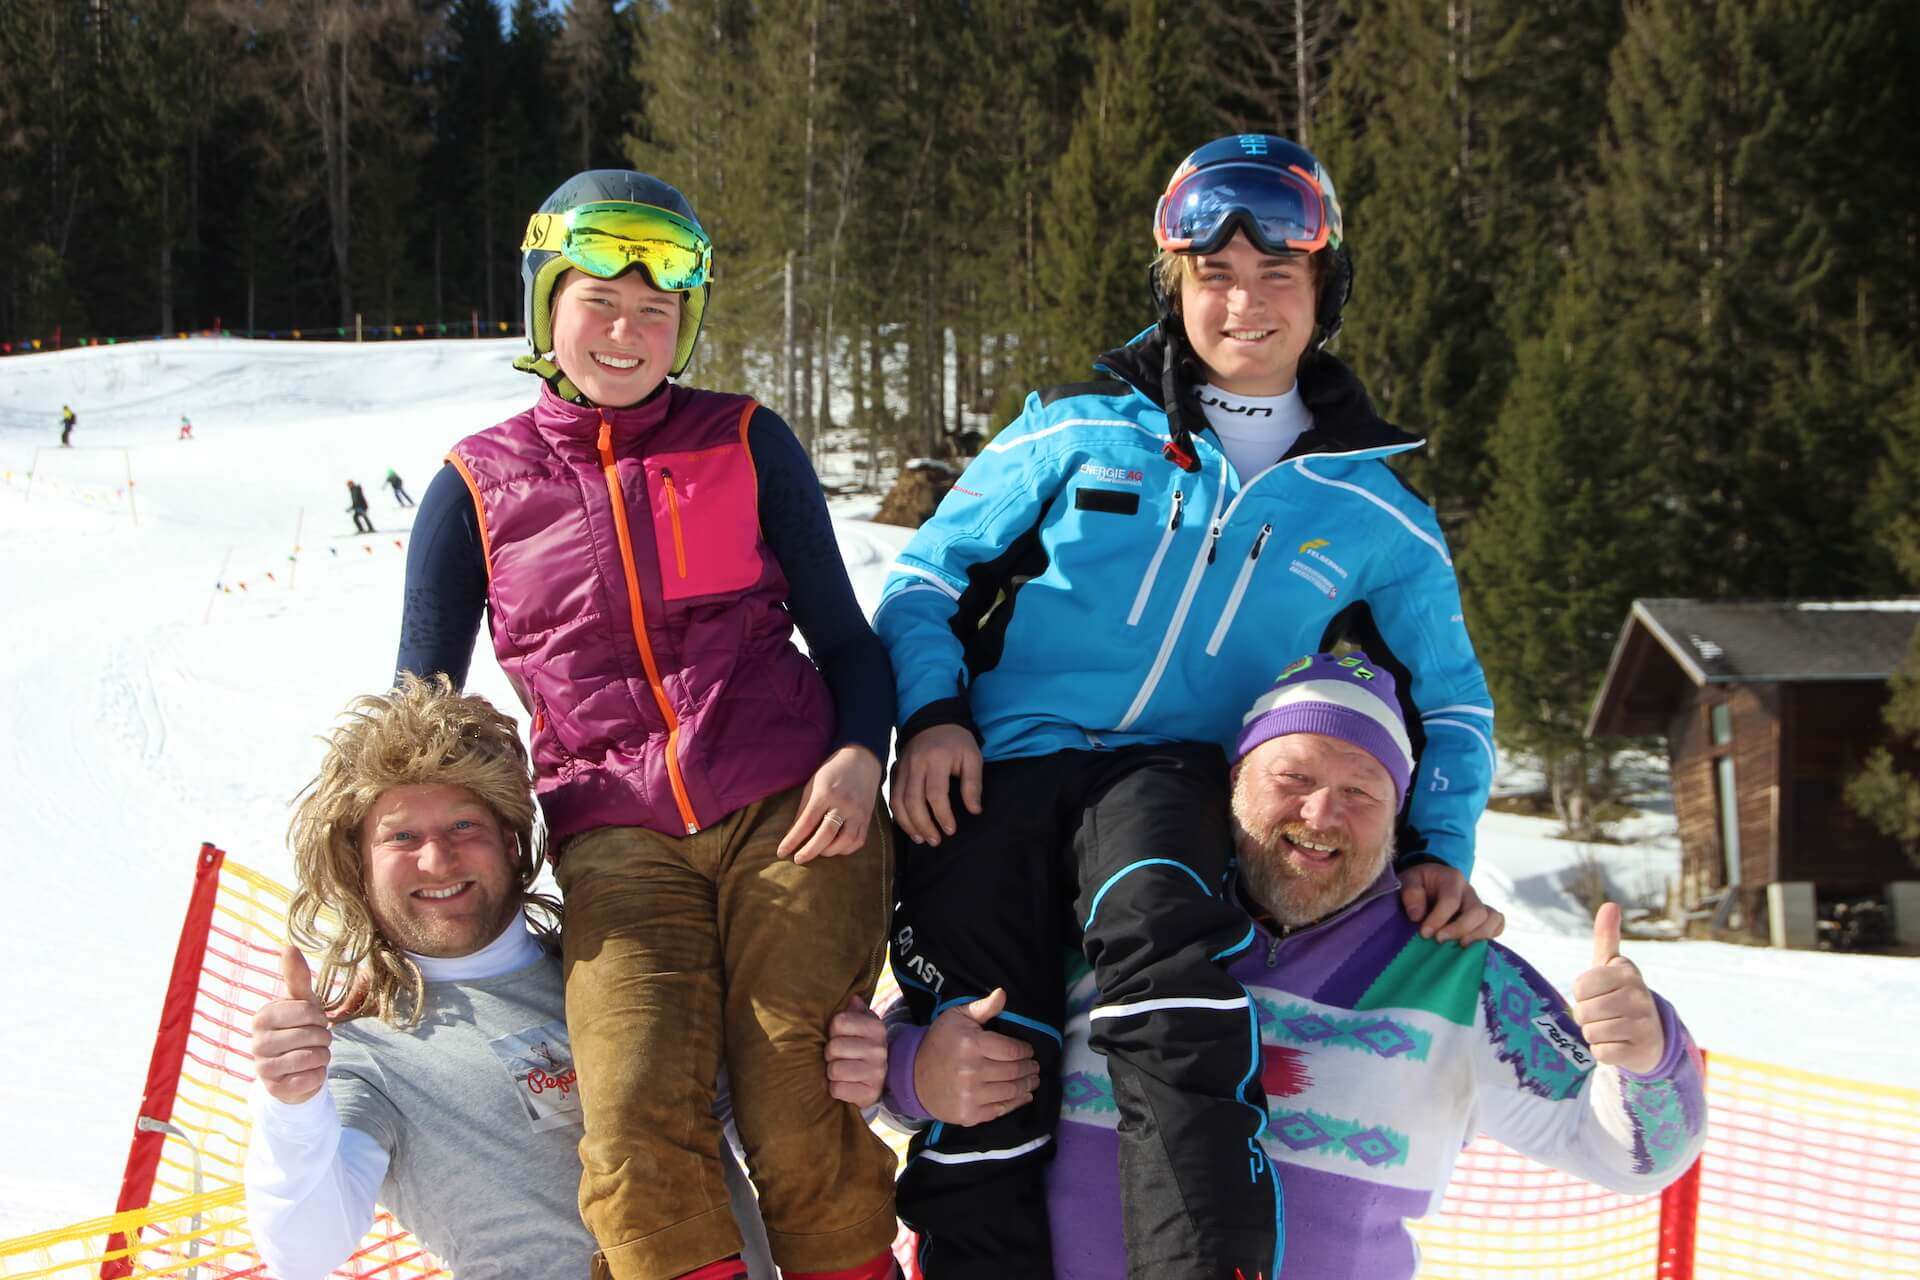 Zeller Schneegestöber Gemeindeskitag 2021 am Kasberg